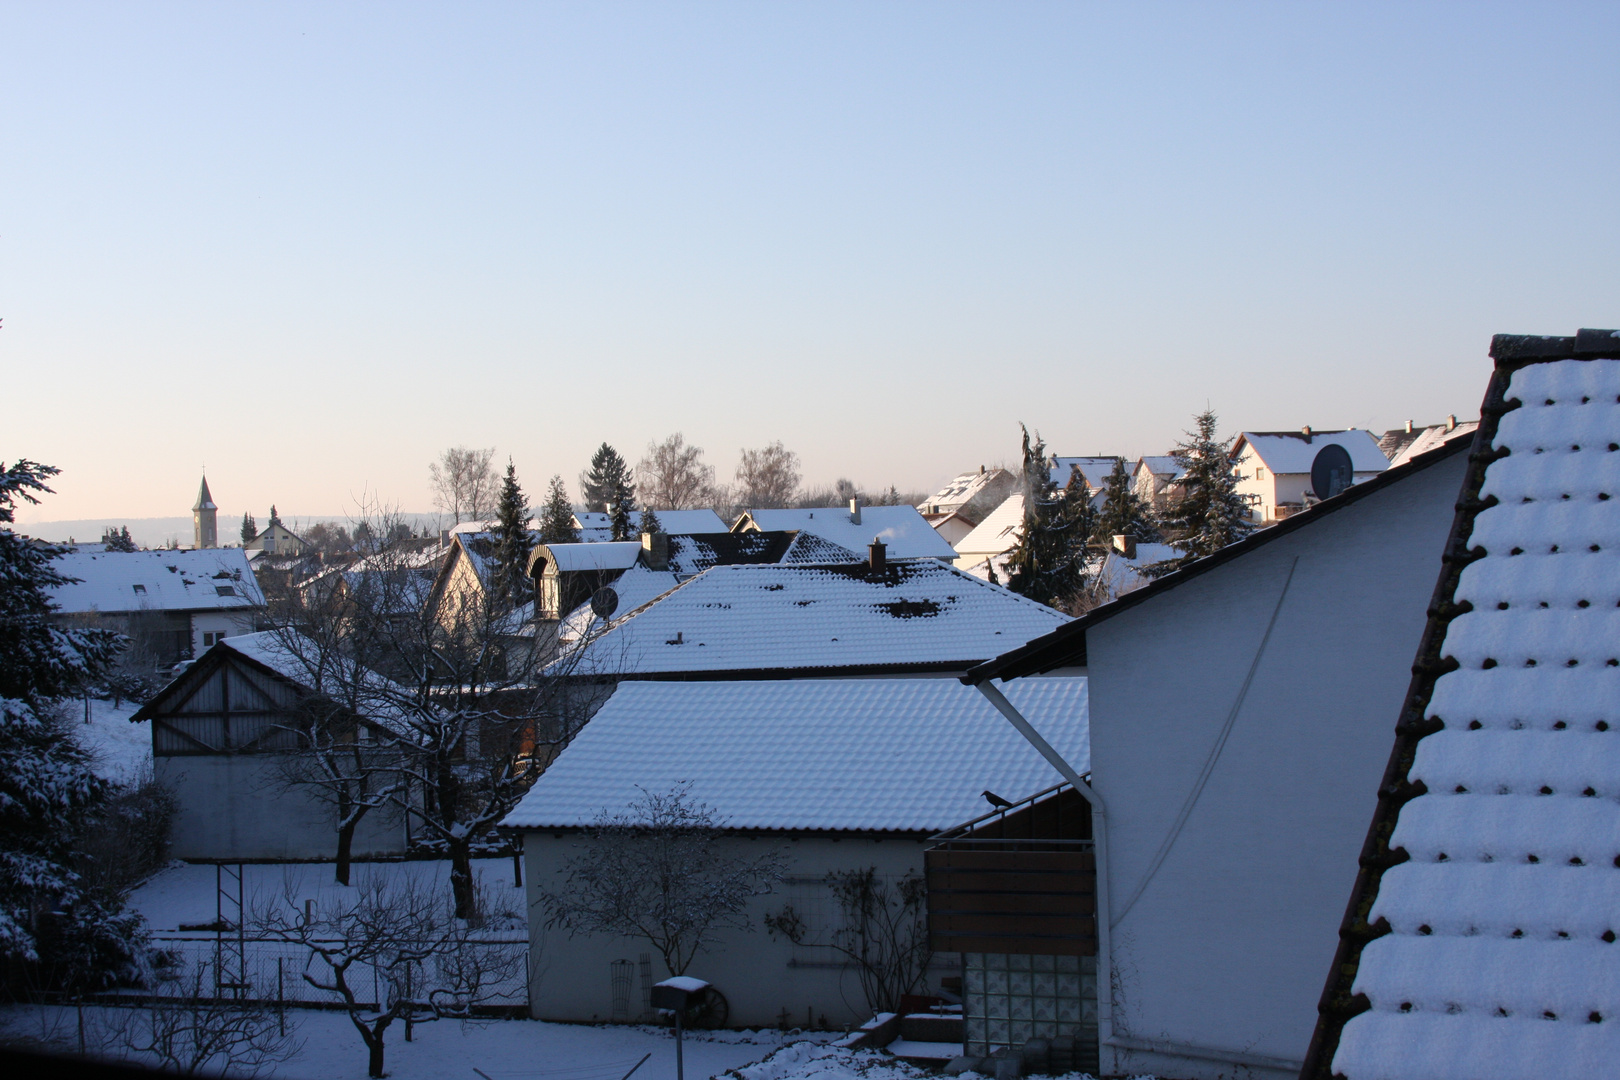 Kalter Februarmorgen